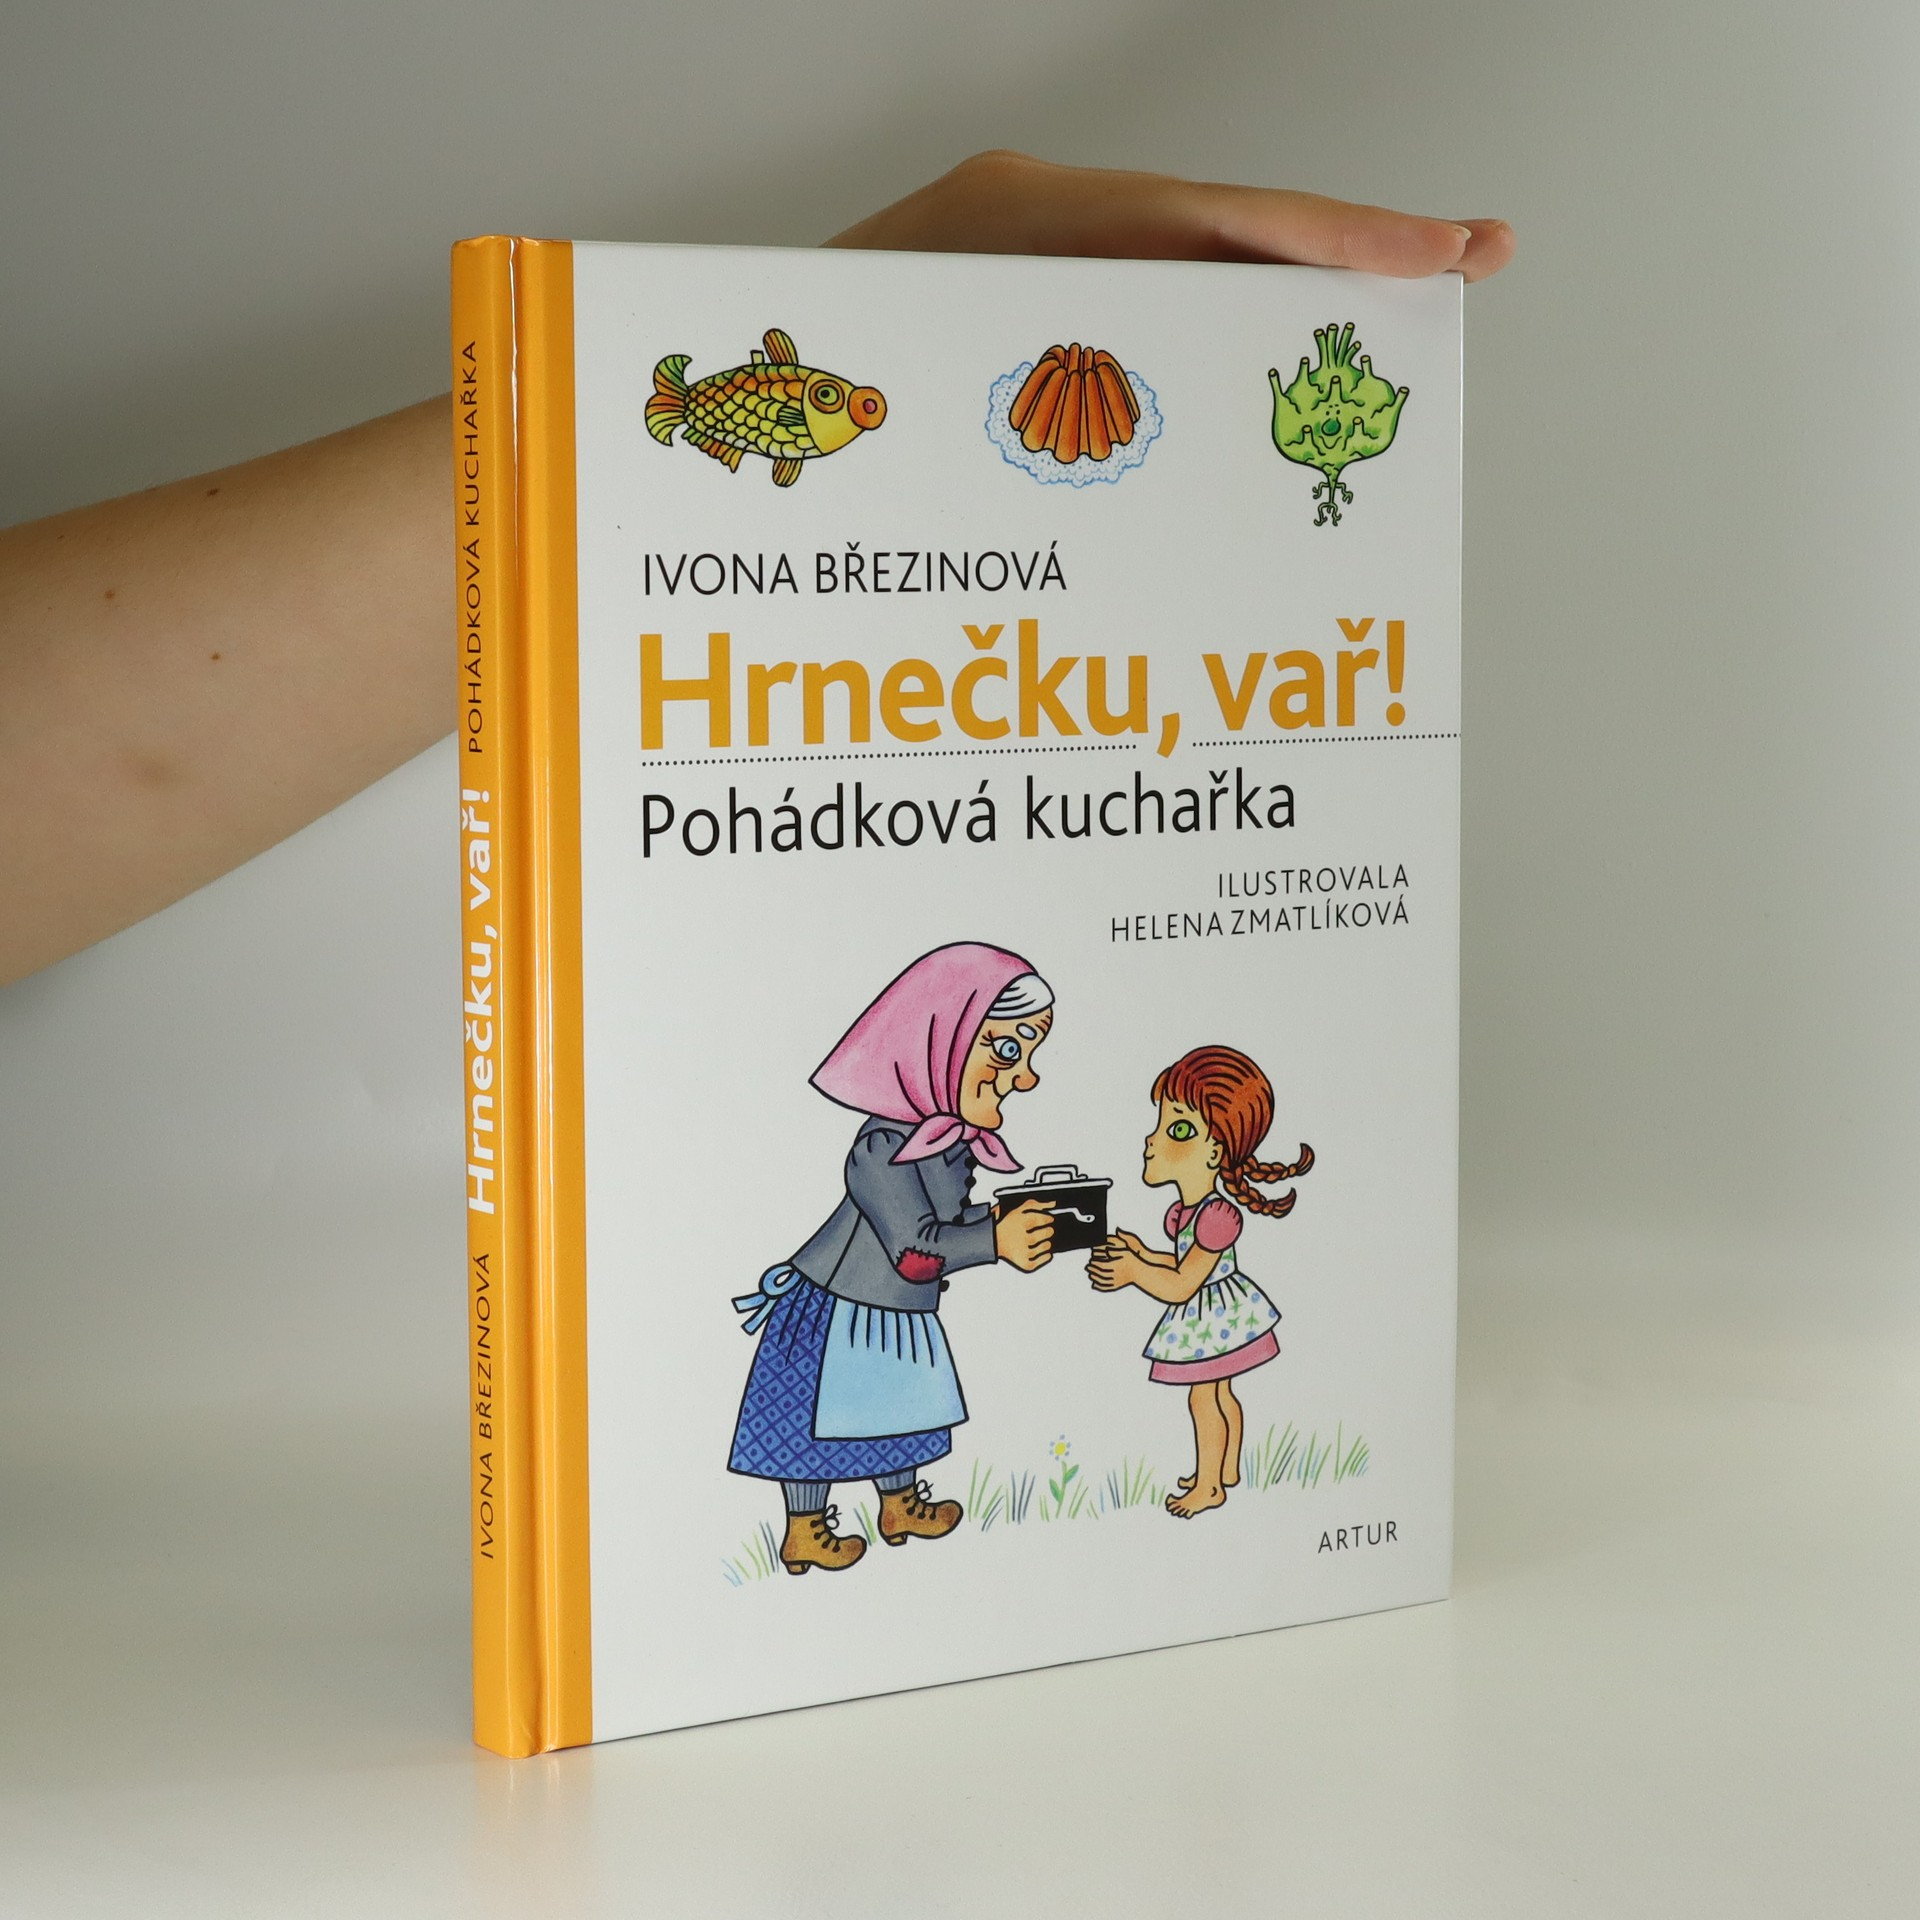 antikvární kniha Hrnečku, vař! : pohádková kuchařka, 2018